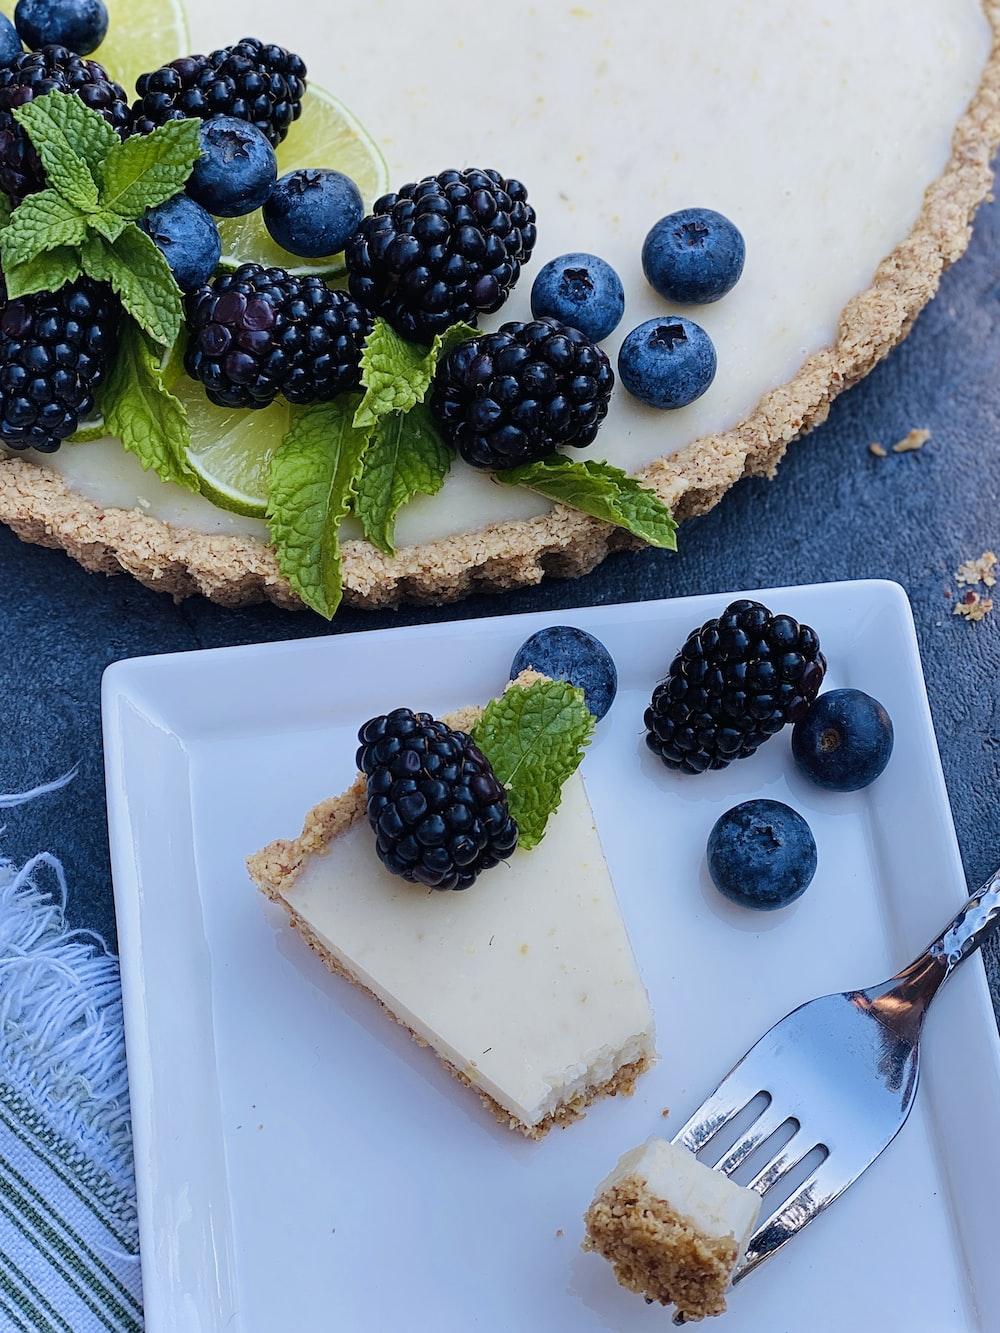 blue berries on white ceramic plate